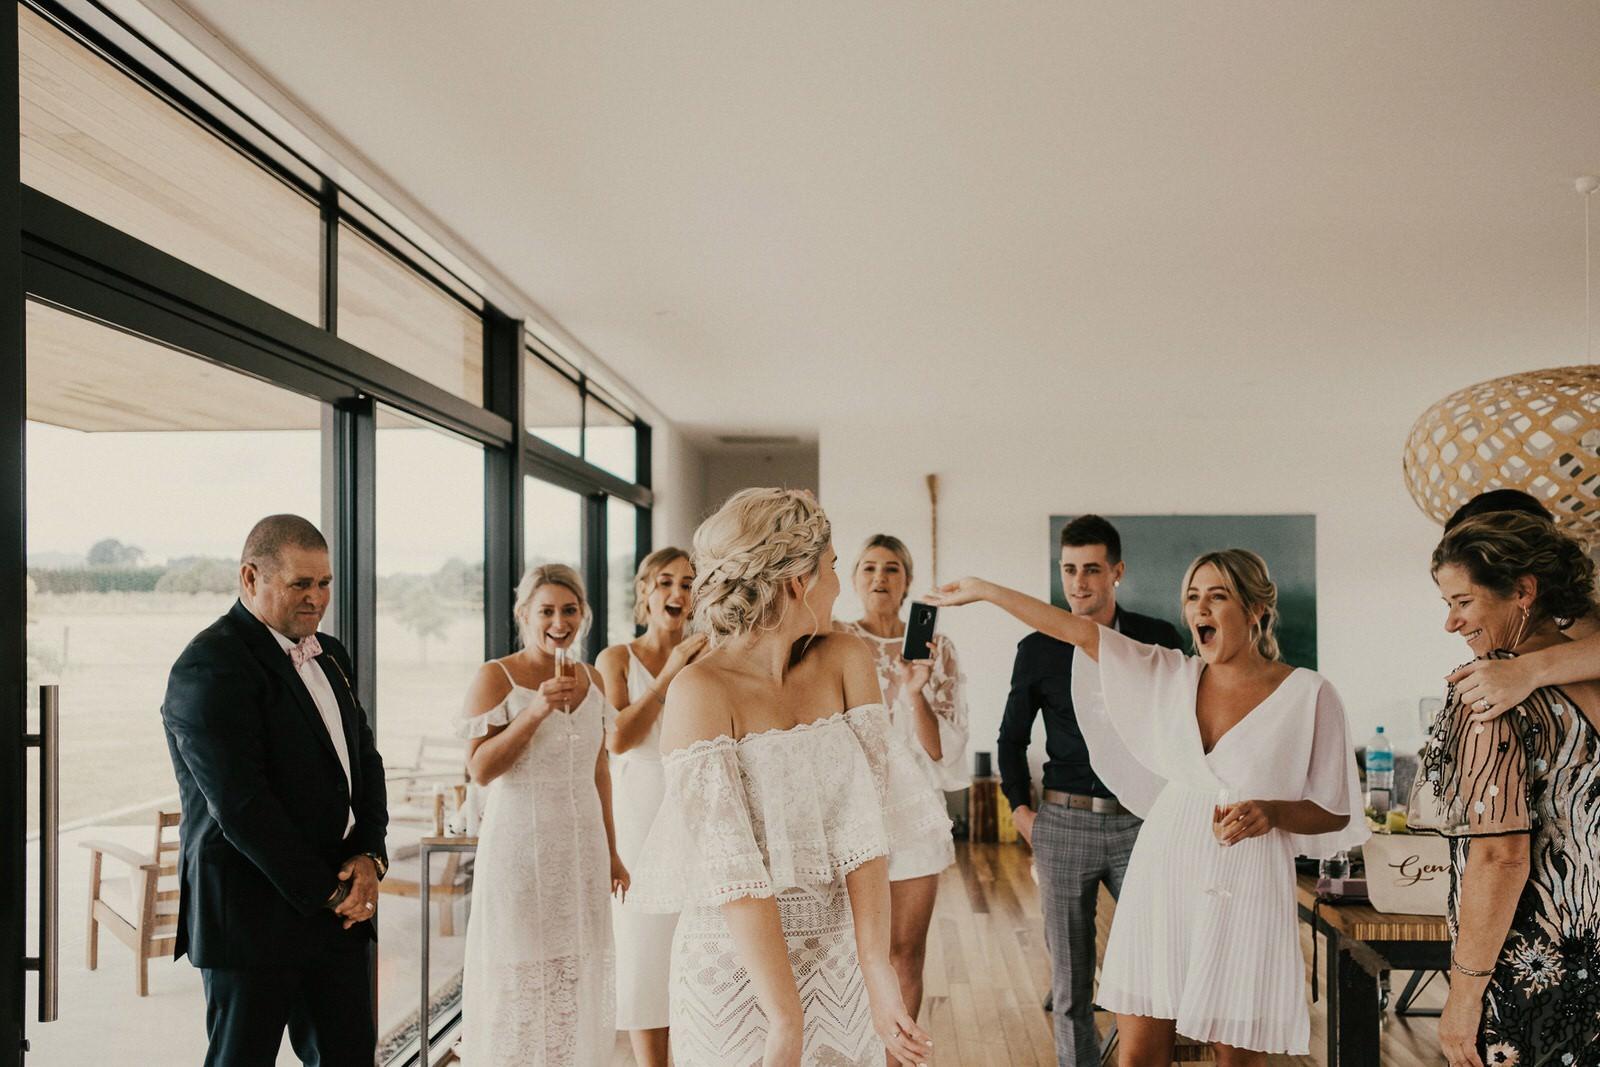 Wairarapa-Wedding_The-Landing_021.JPG